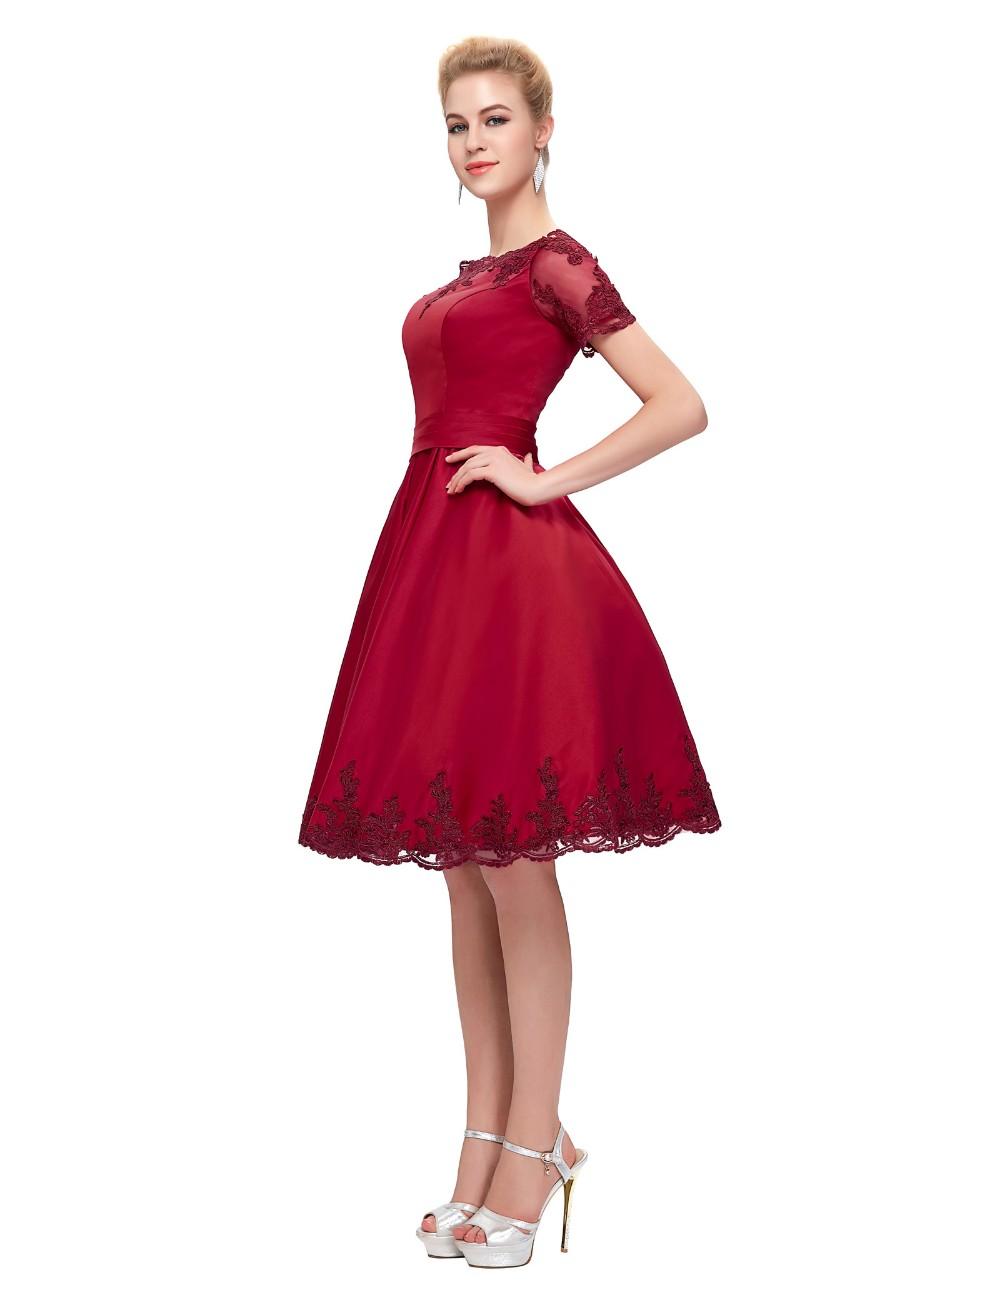 Short Cocktail Dresses 2018 Grace Karin Off The Shoulder robe de Cocktail Wedding Party Dress Satin Champagne Red Coctail Dress 7